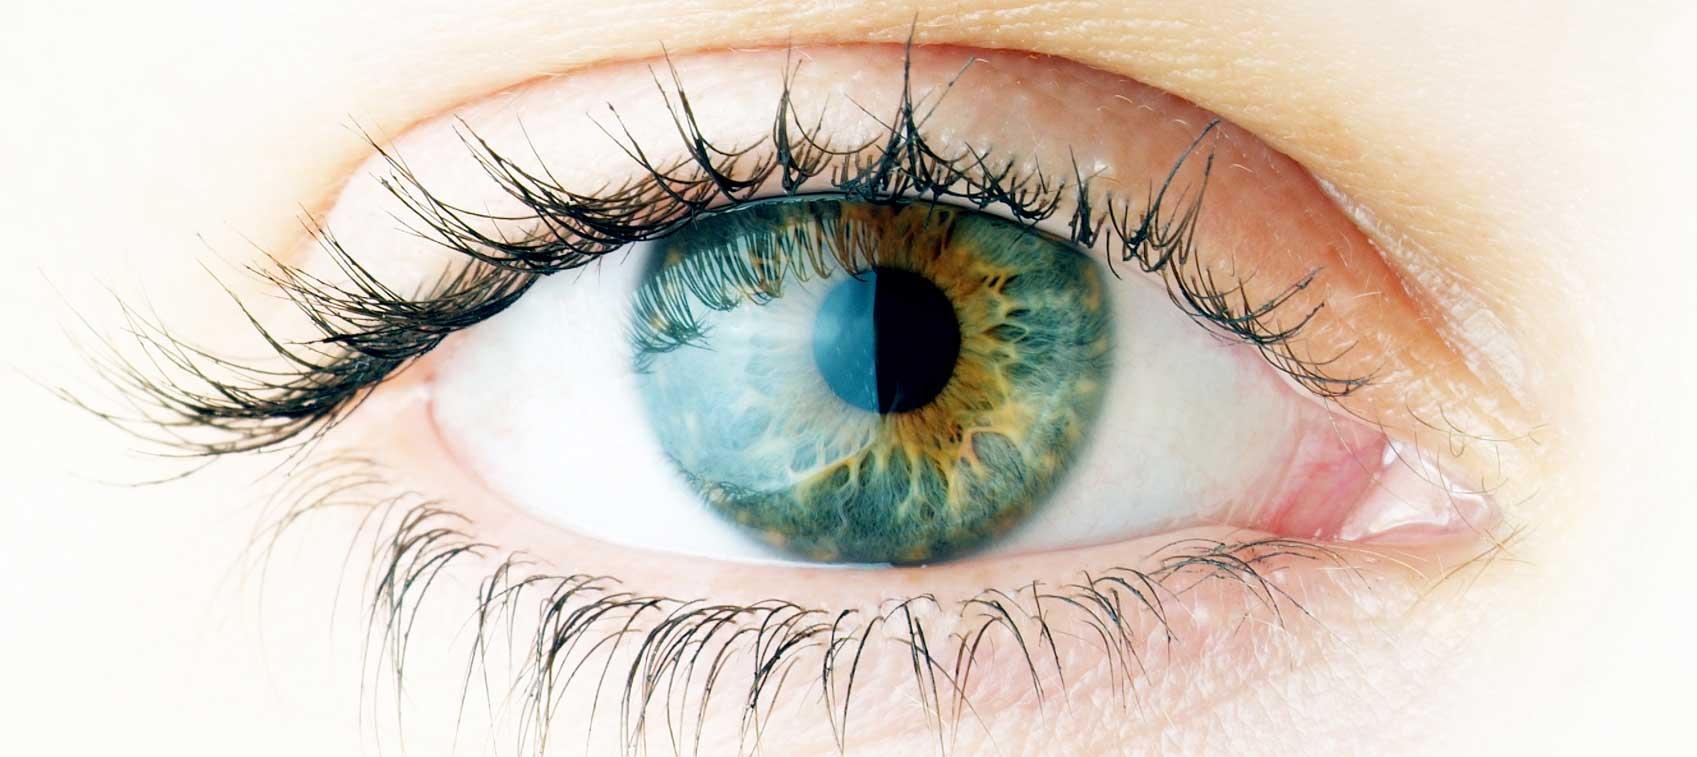 Optometrist in Gold Coast.